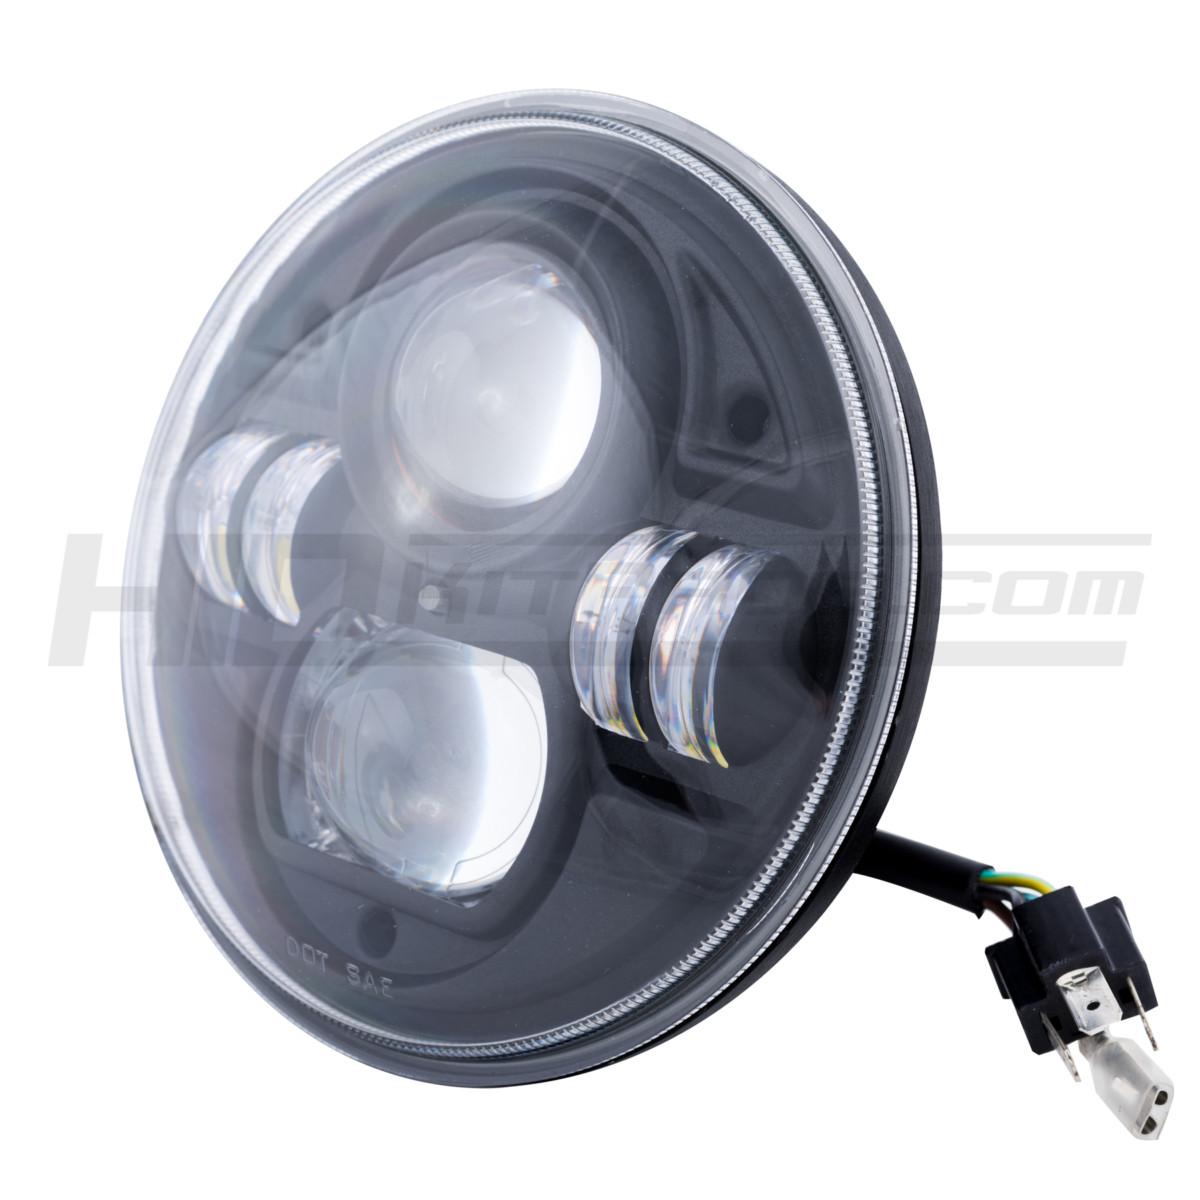 H6024 Bulb Wiring - Wiring Diagram Online on